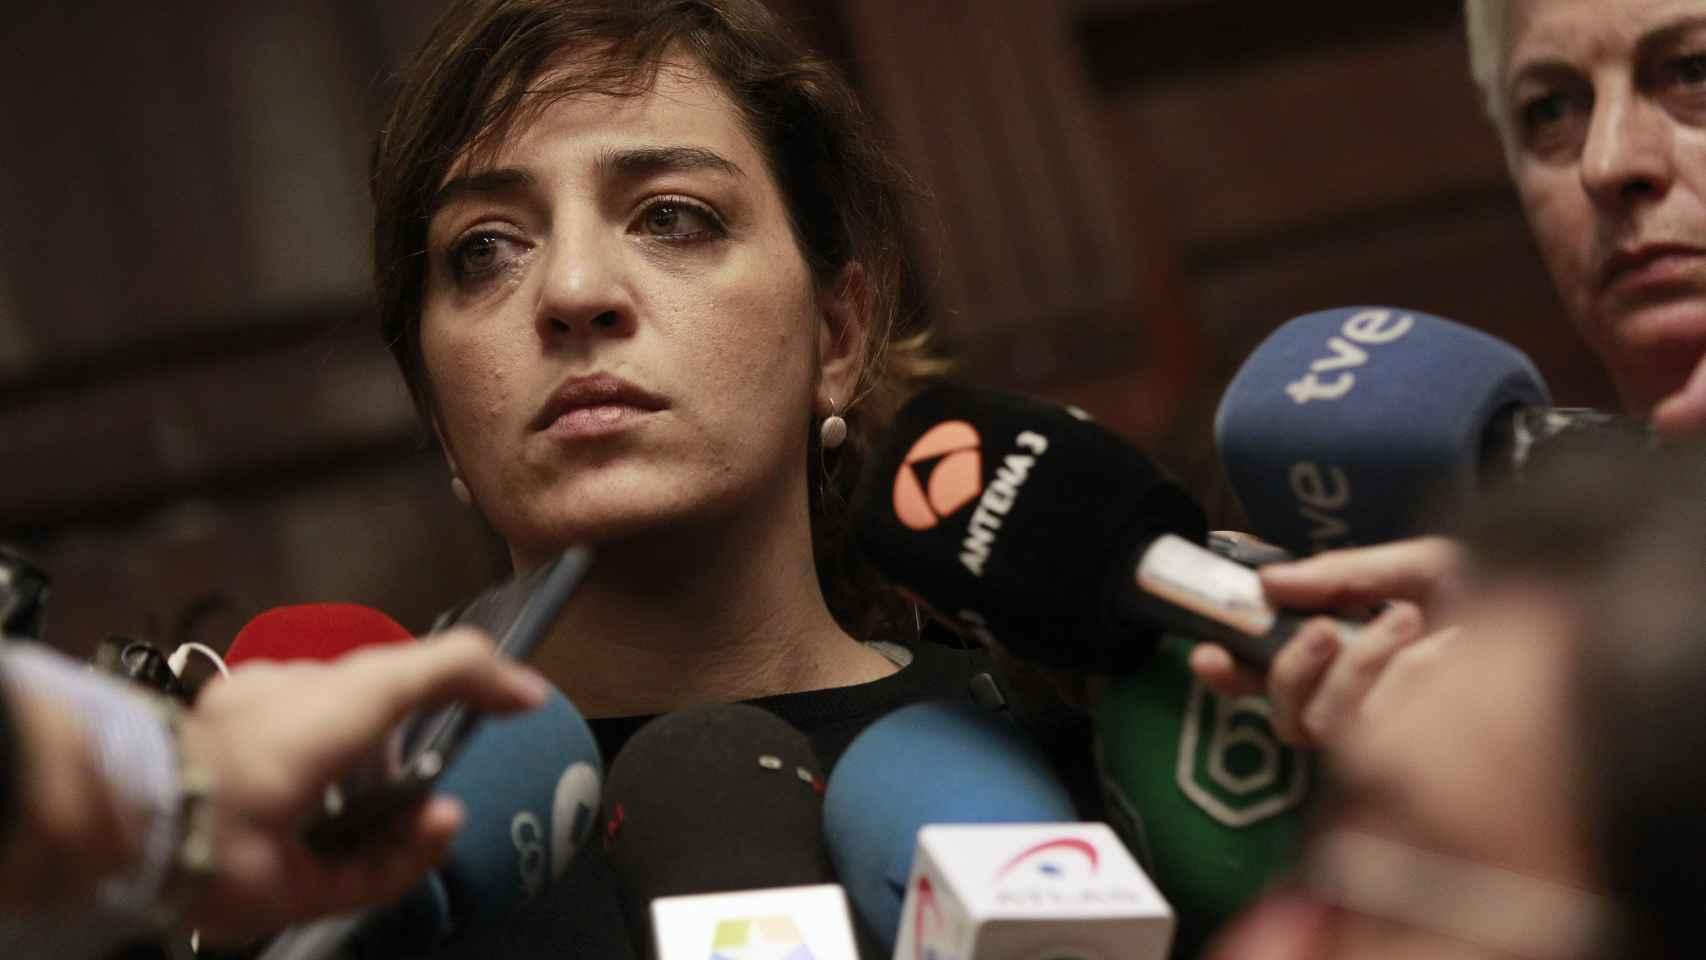 La concejal de Cultura, Celia Mayer, da explicaciones a los medios